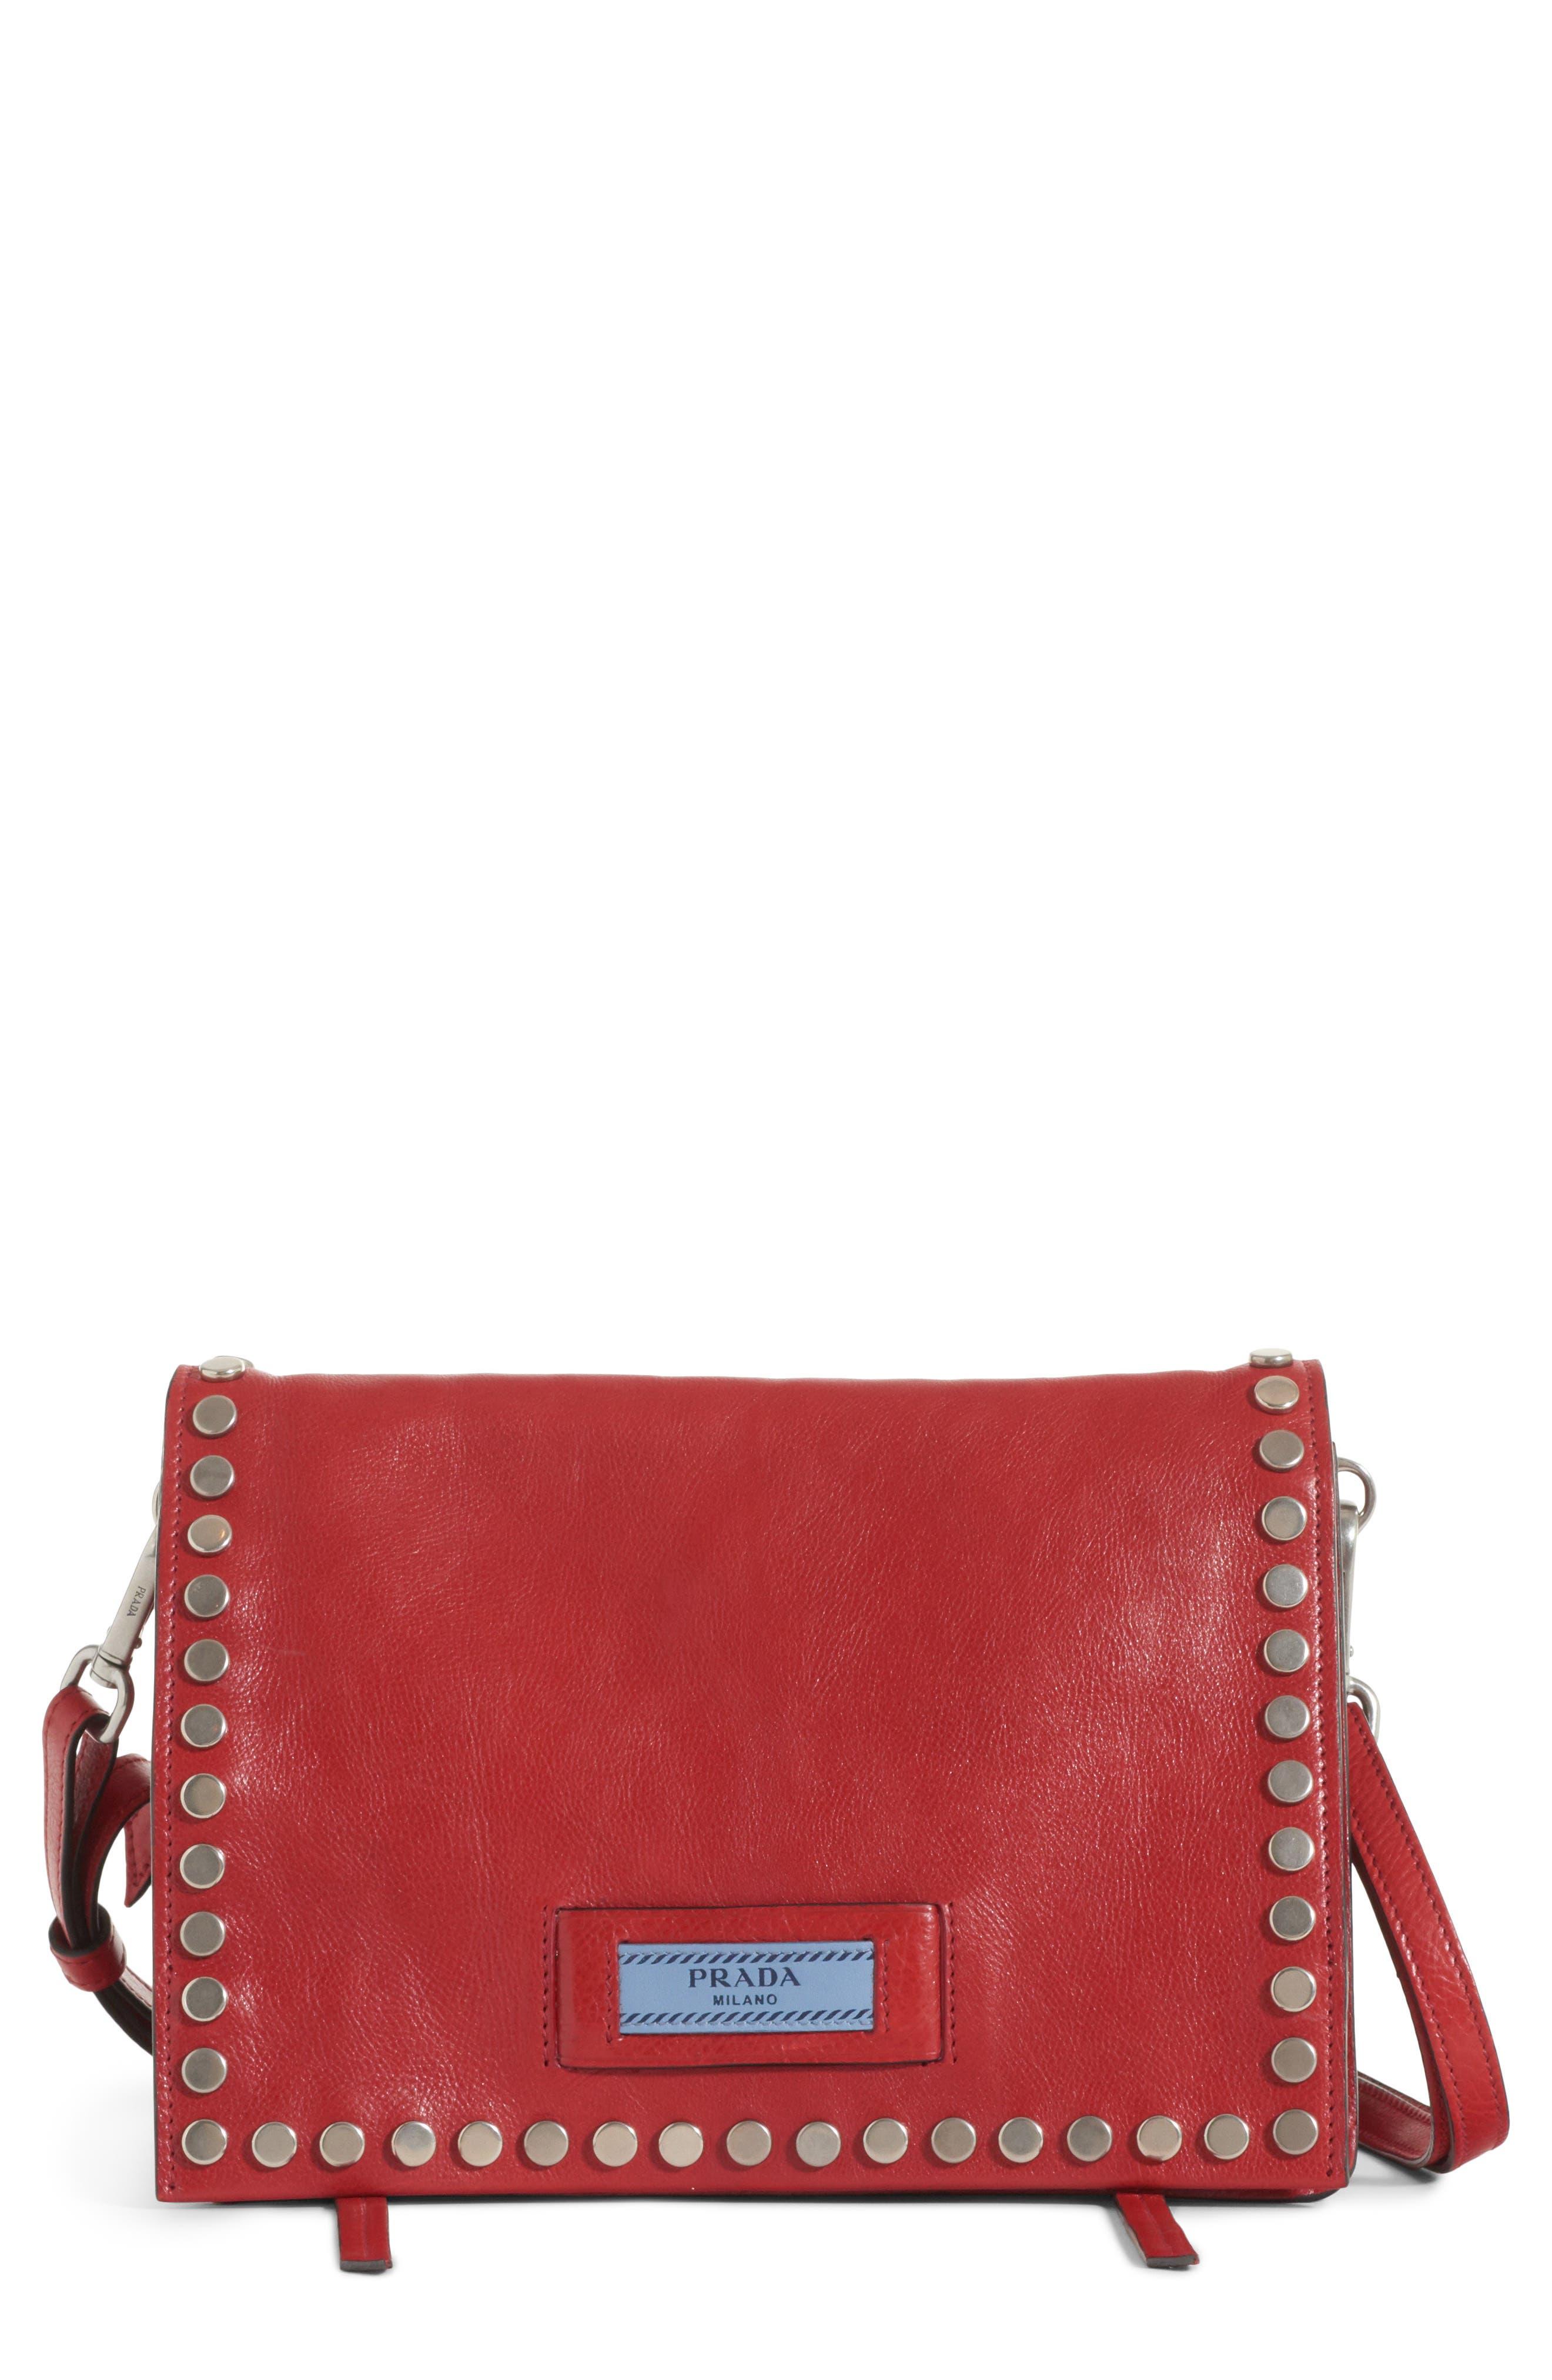 7d062d7ceeab Prada Crossbody Bags